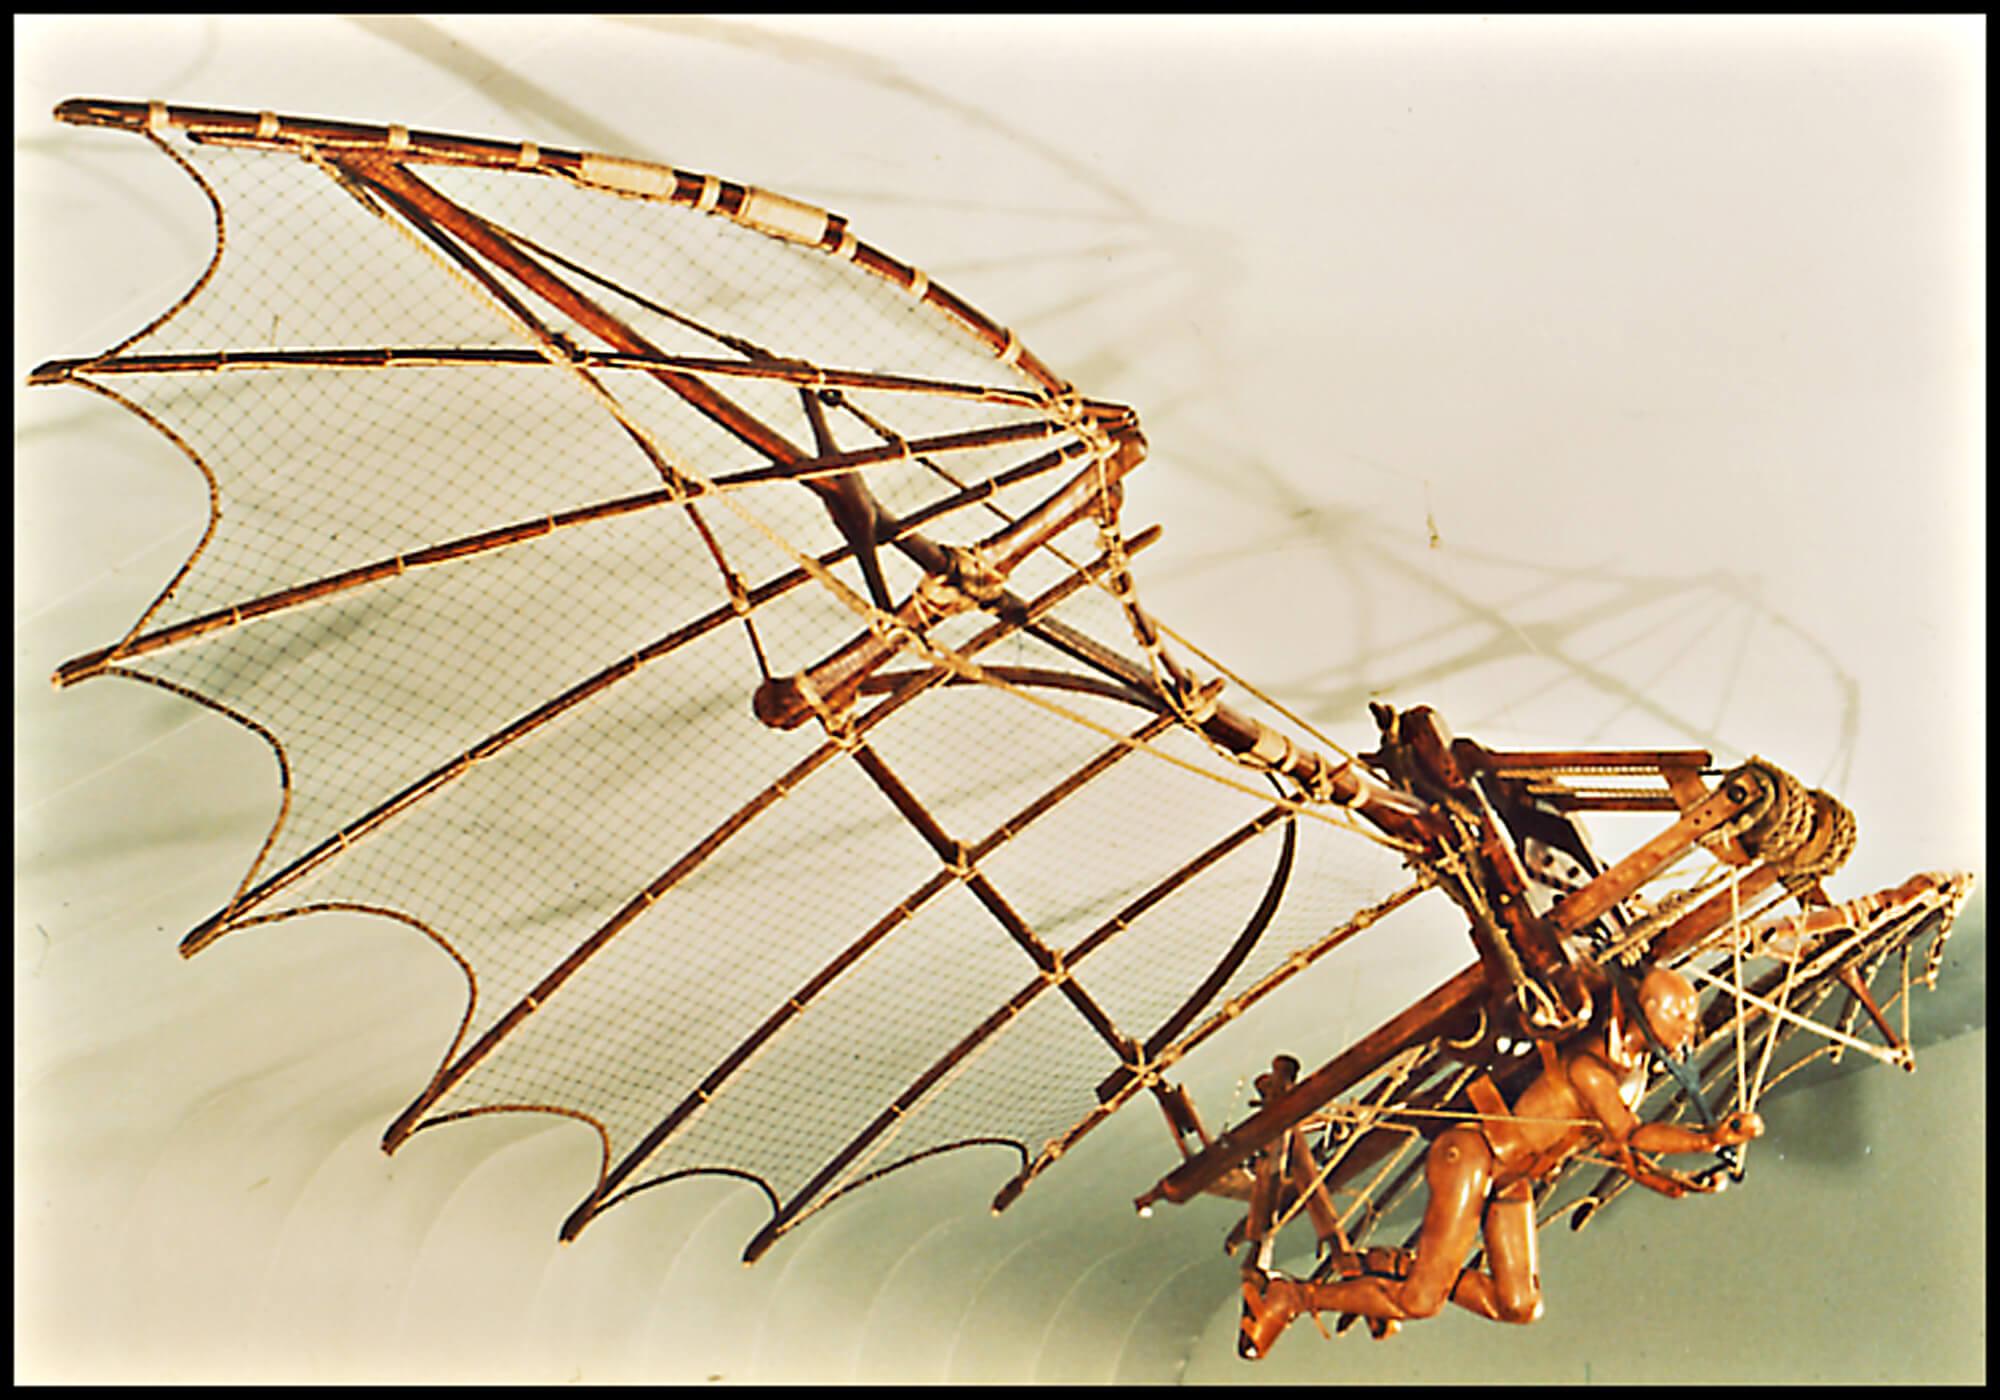 File:Leonardo da vinci, Flying machine.jpg - Wikimedia Commons |Leonardo Da Vinci Flying Machine